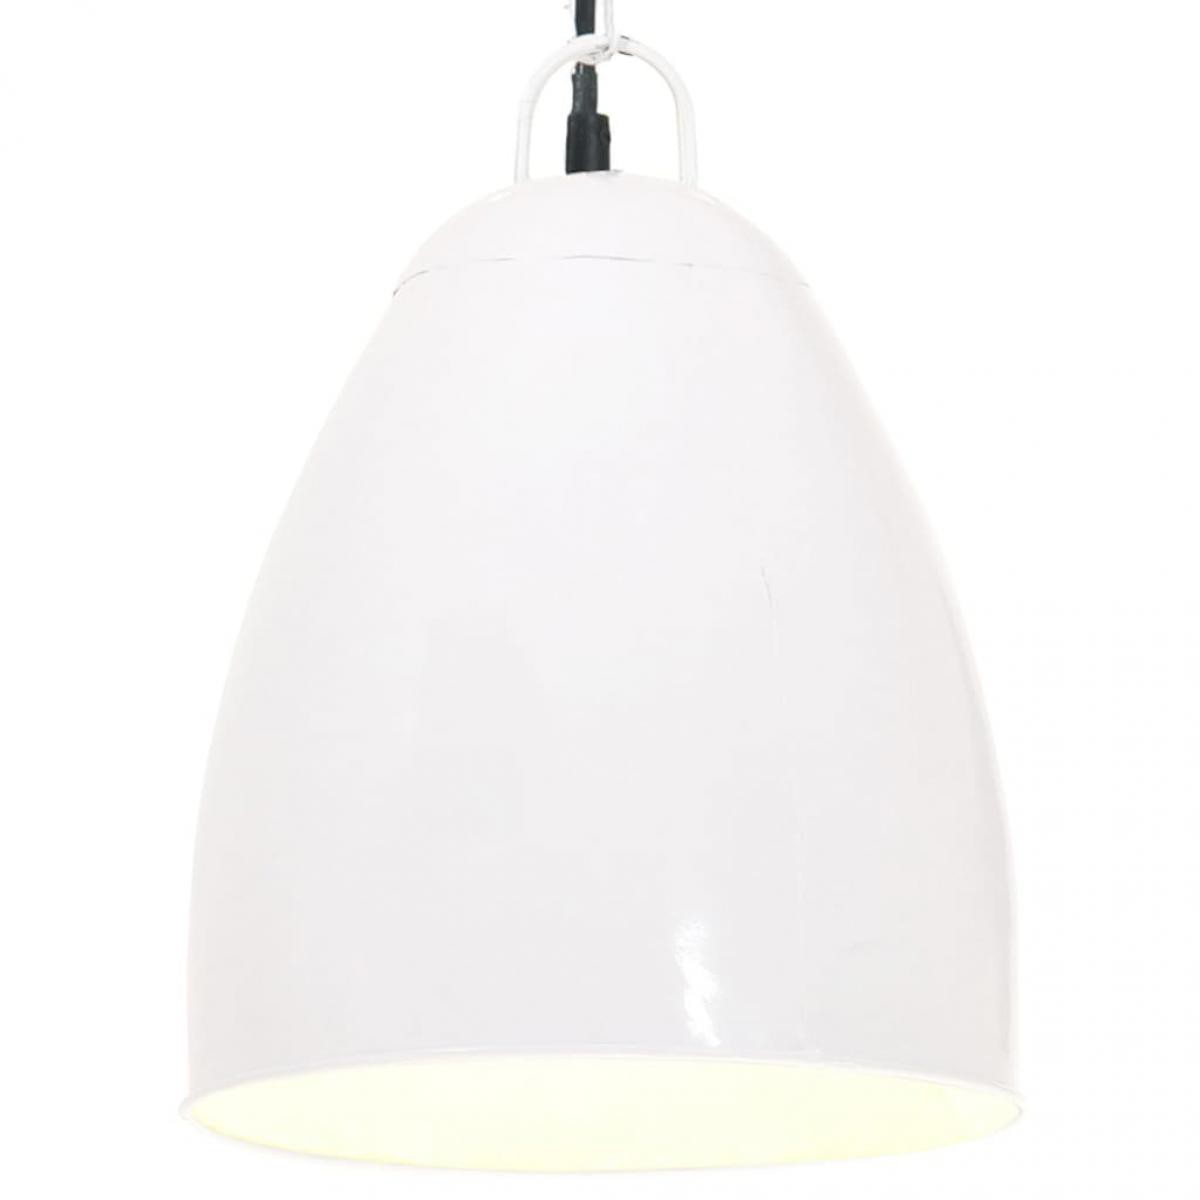 Vidaxl vidaXL Lampe suspendue industrielle 25 W Blanc Rond 32 cm E27